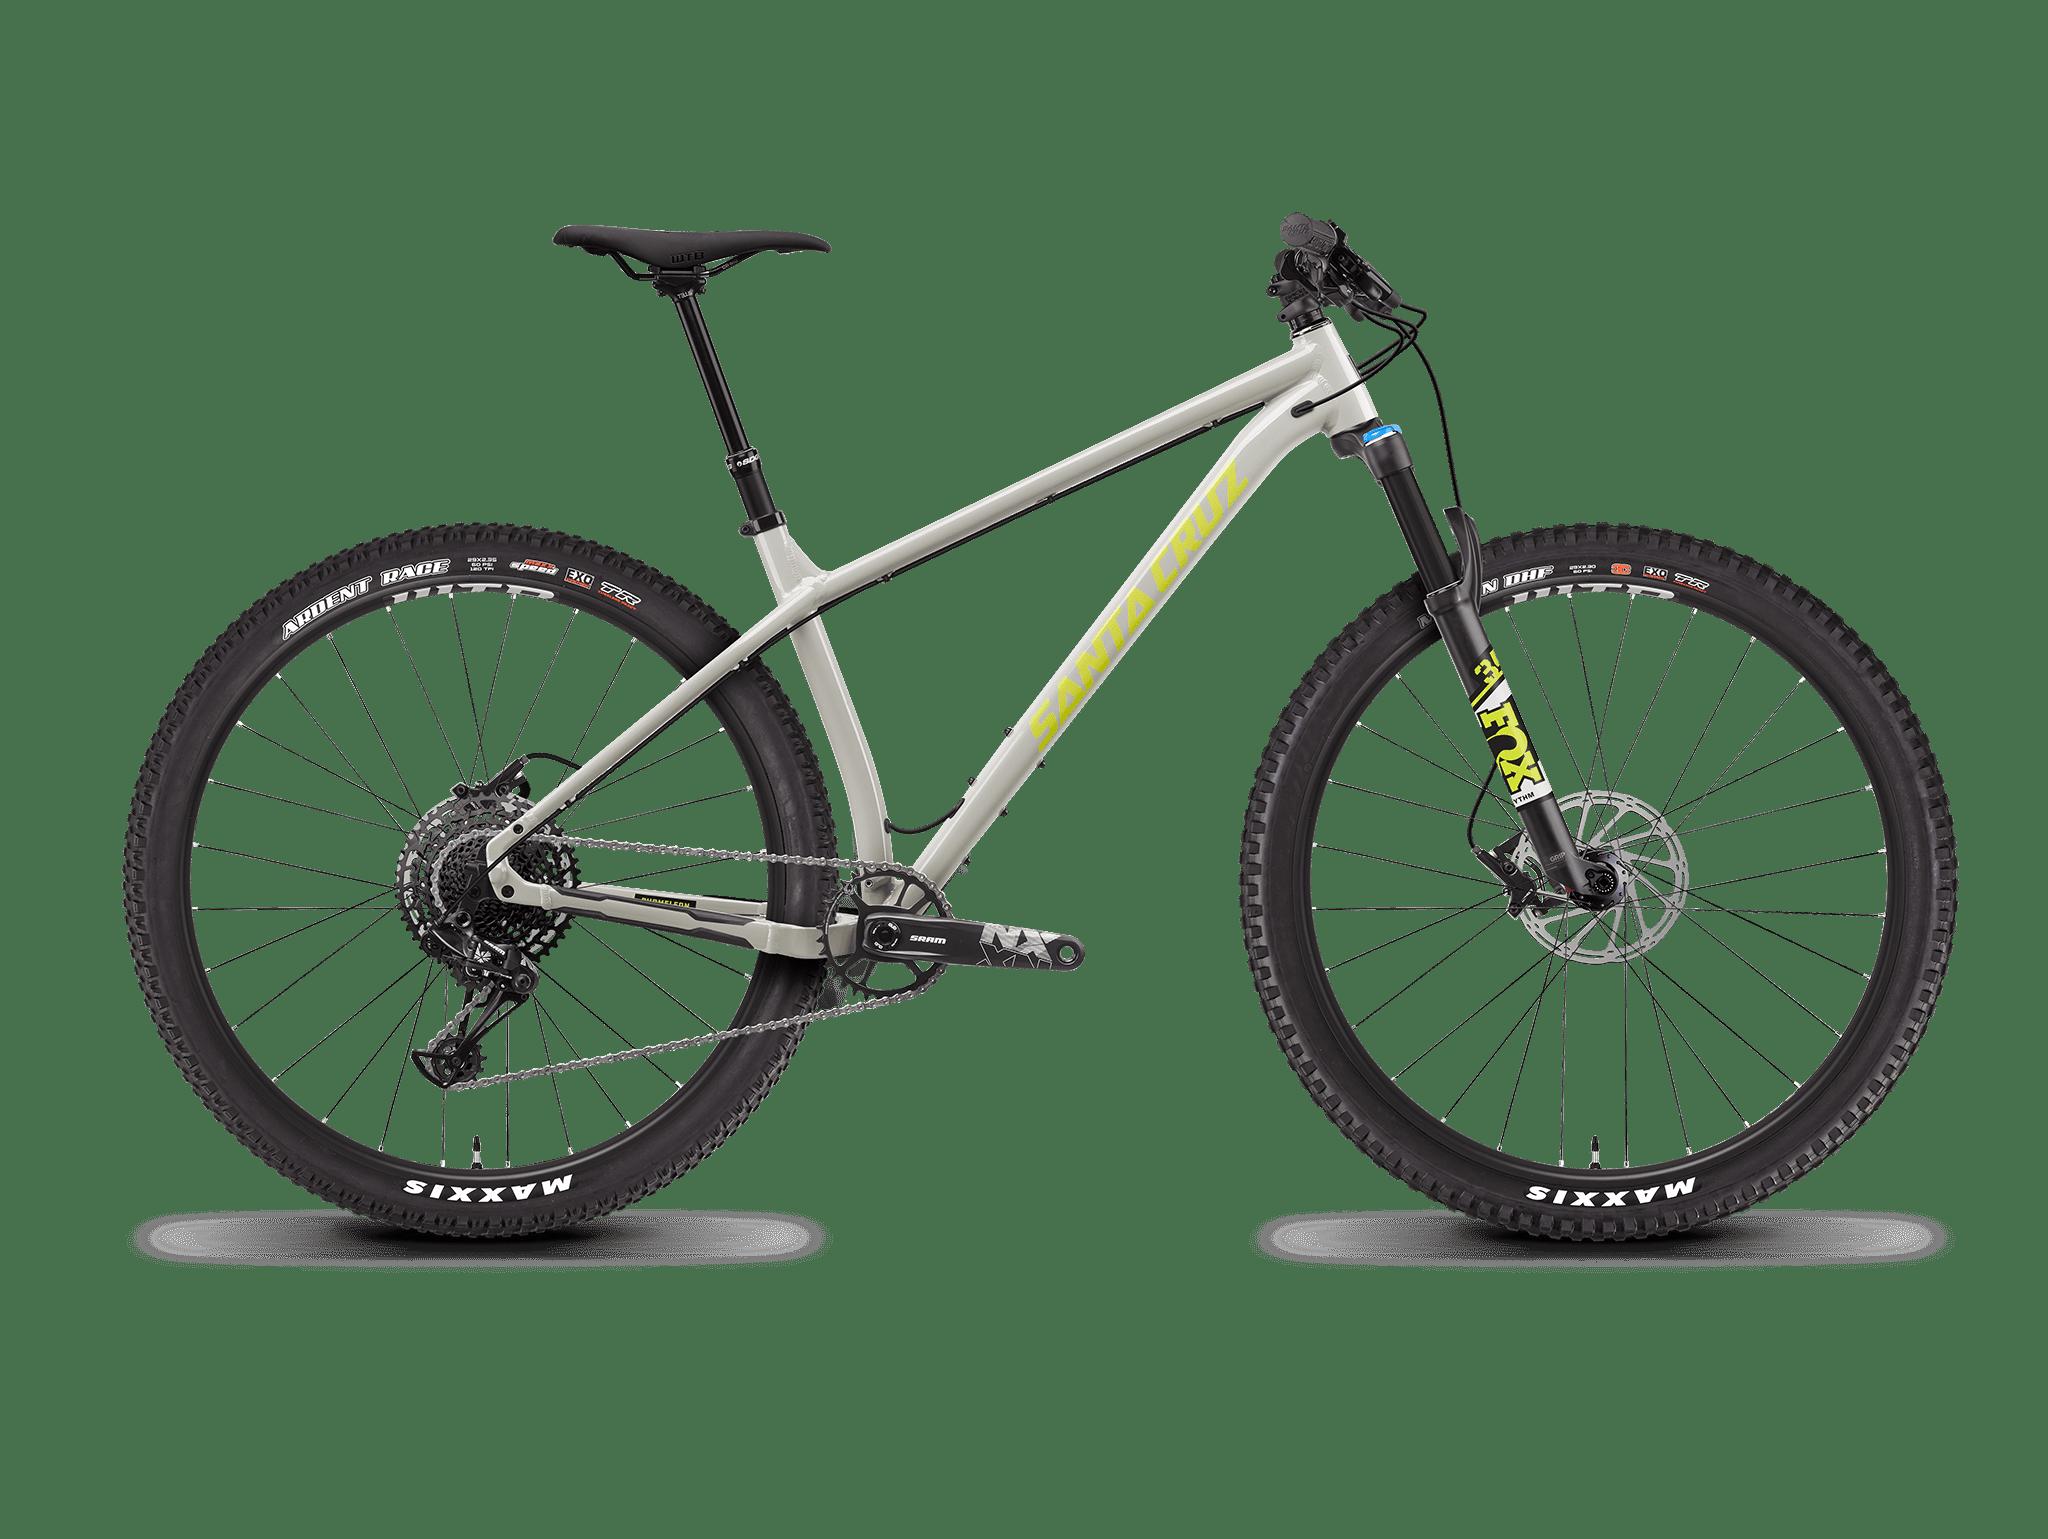 Santa Cruz Santa Cruz Chameleon - R / Aluminum (2021)